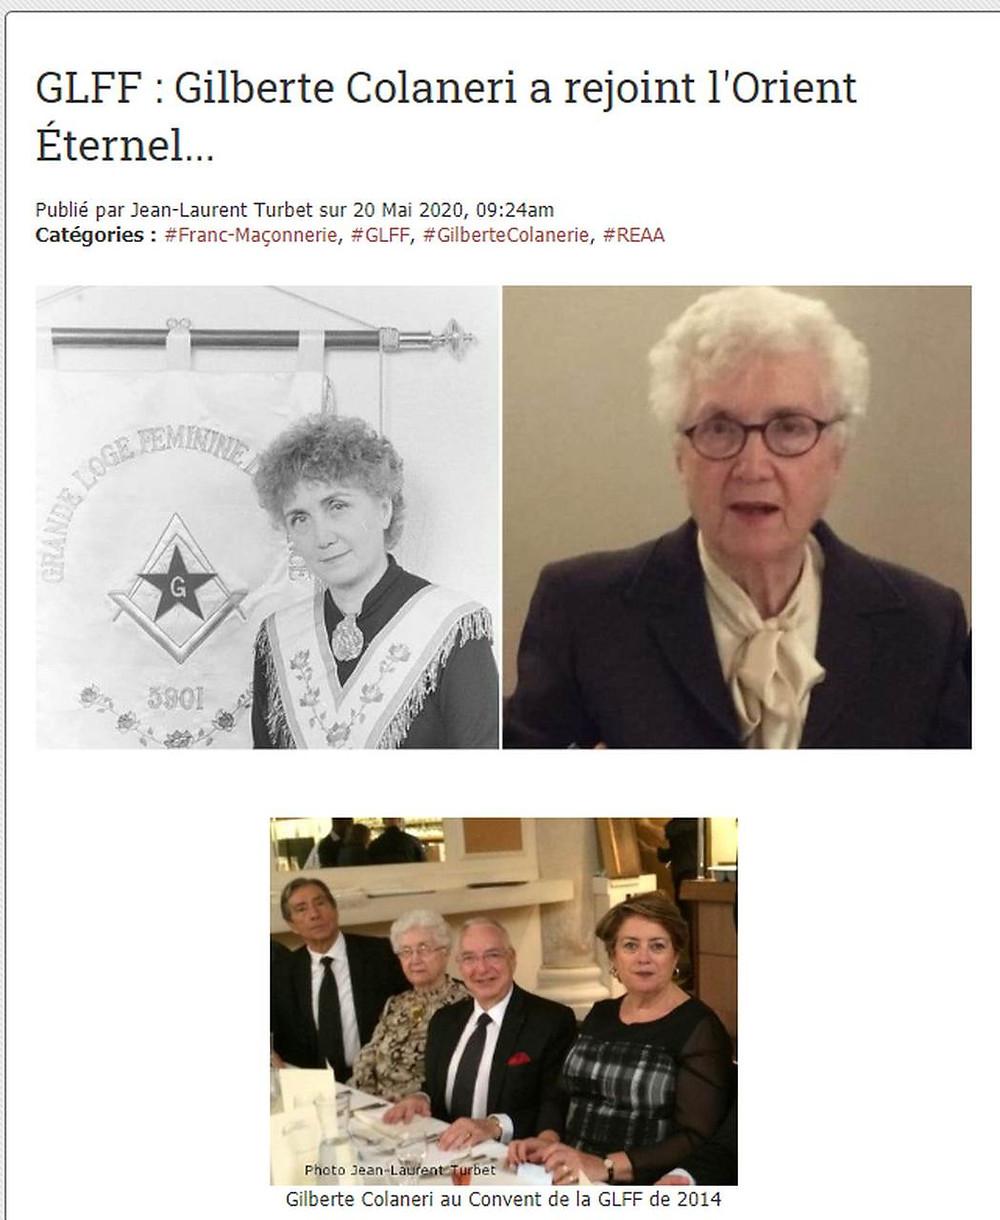 Irmã Gilberte Colaneri partiu para Oriente Eterno